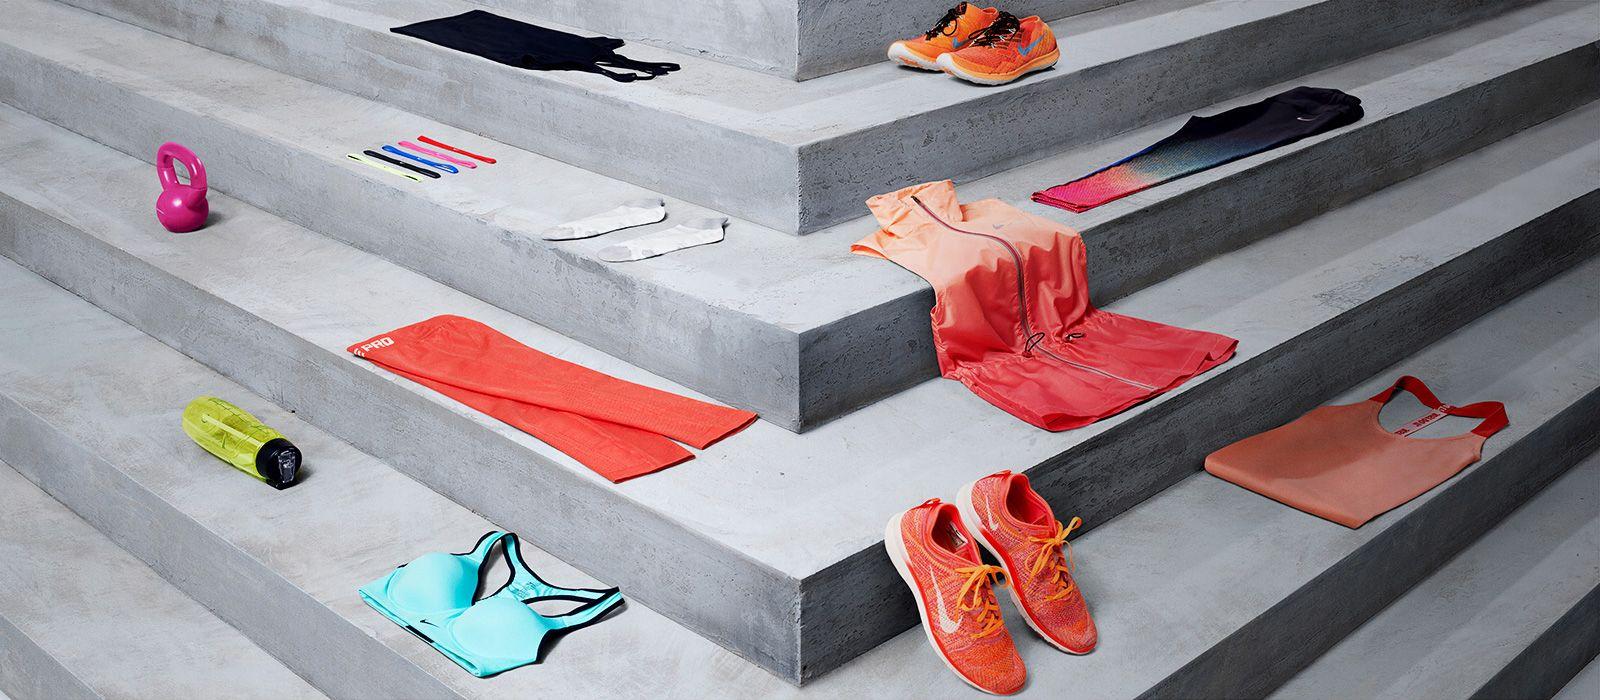 Nike uses AI to Meet Customer Demands